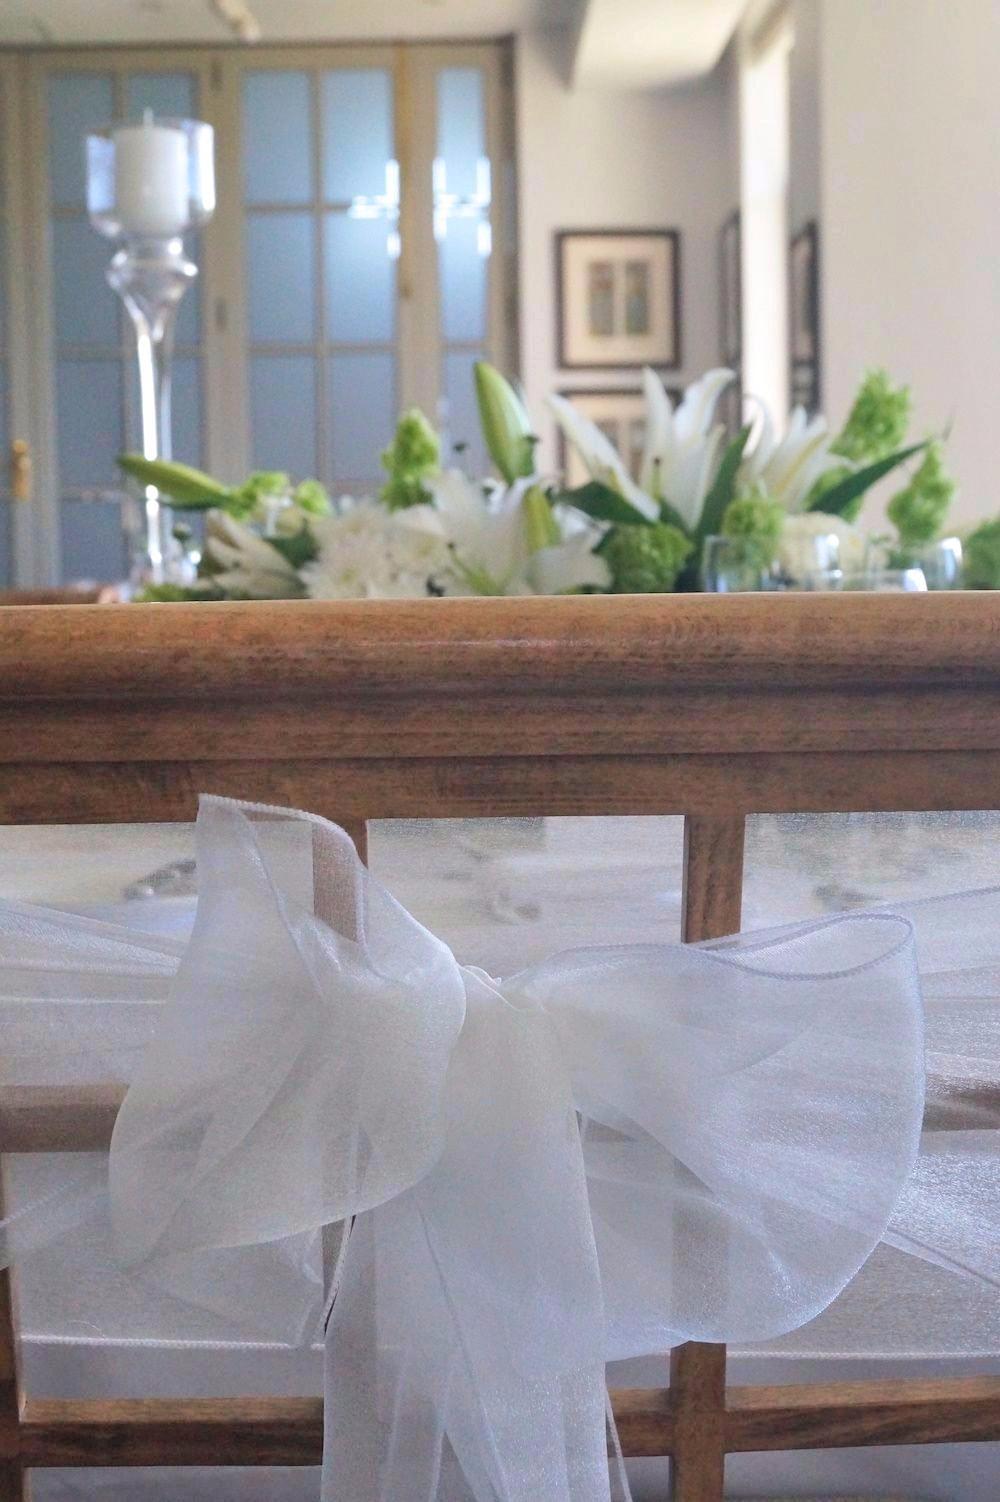 the-wedding-decorator-event-stylist-sydney-weddings-chair-covers.jpg